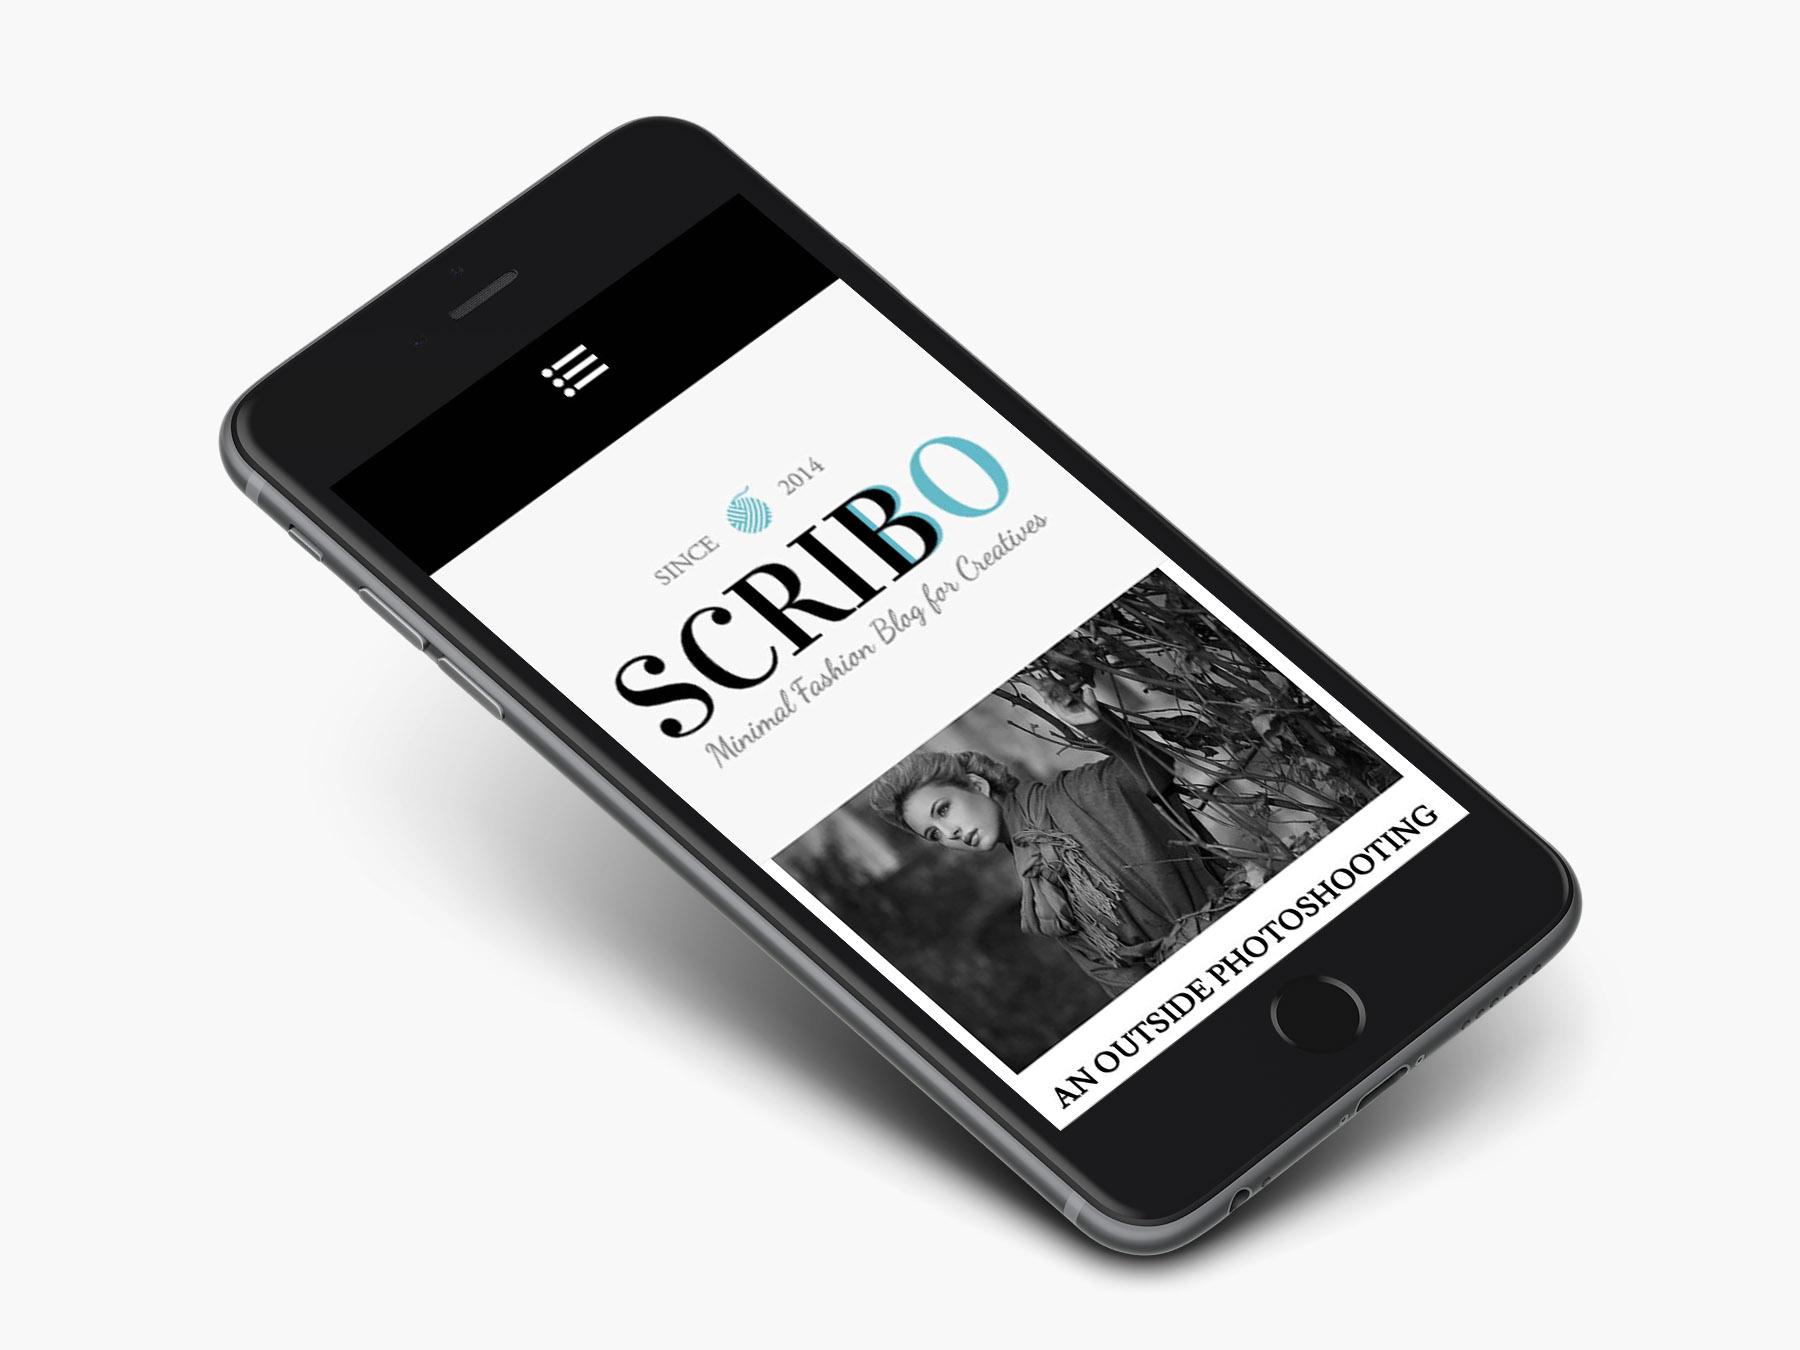 scribbo-wordpress-theme-iphone